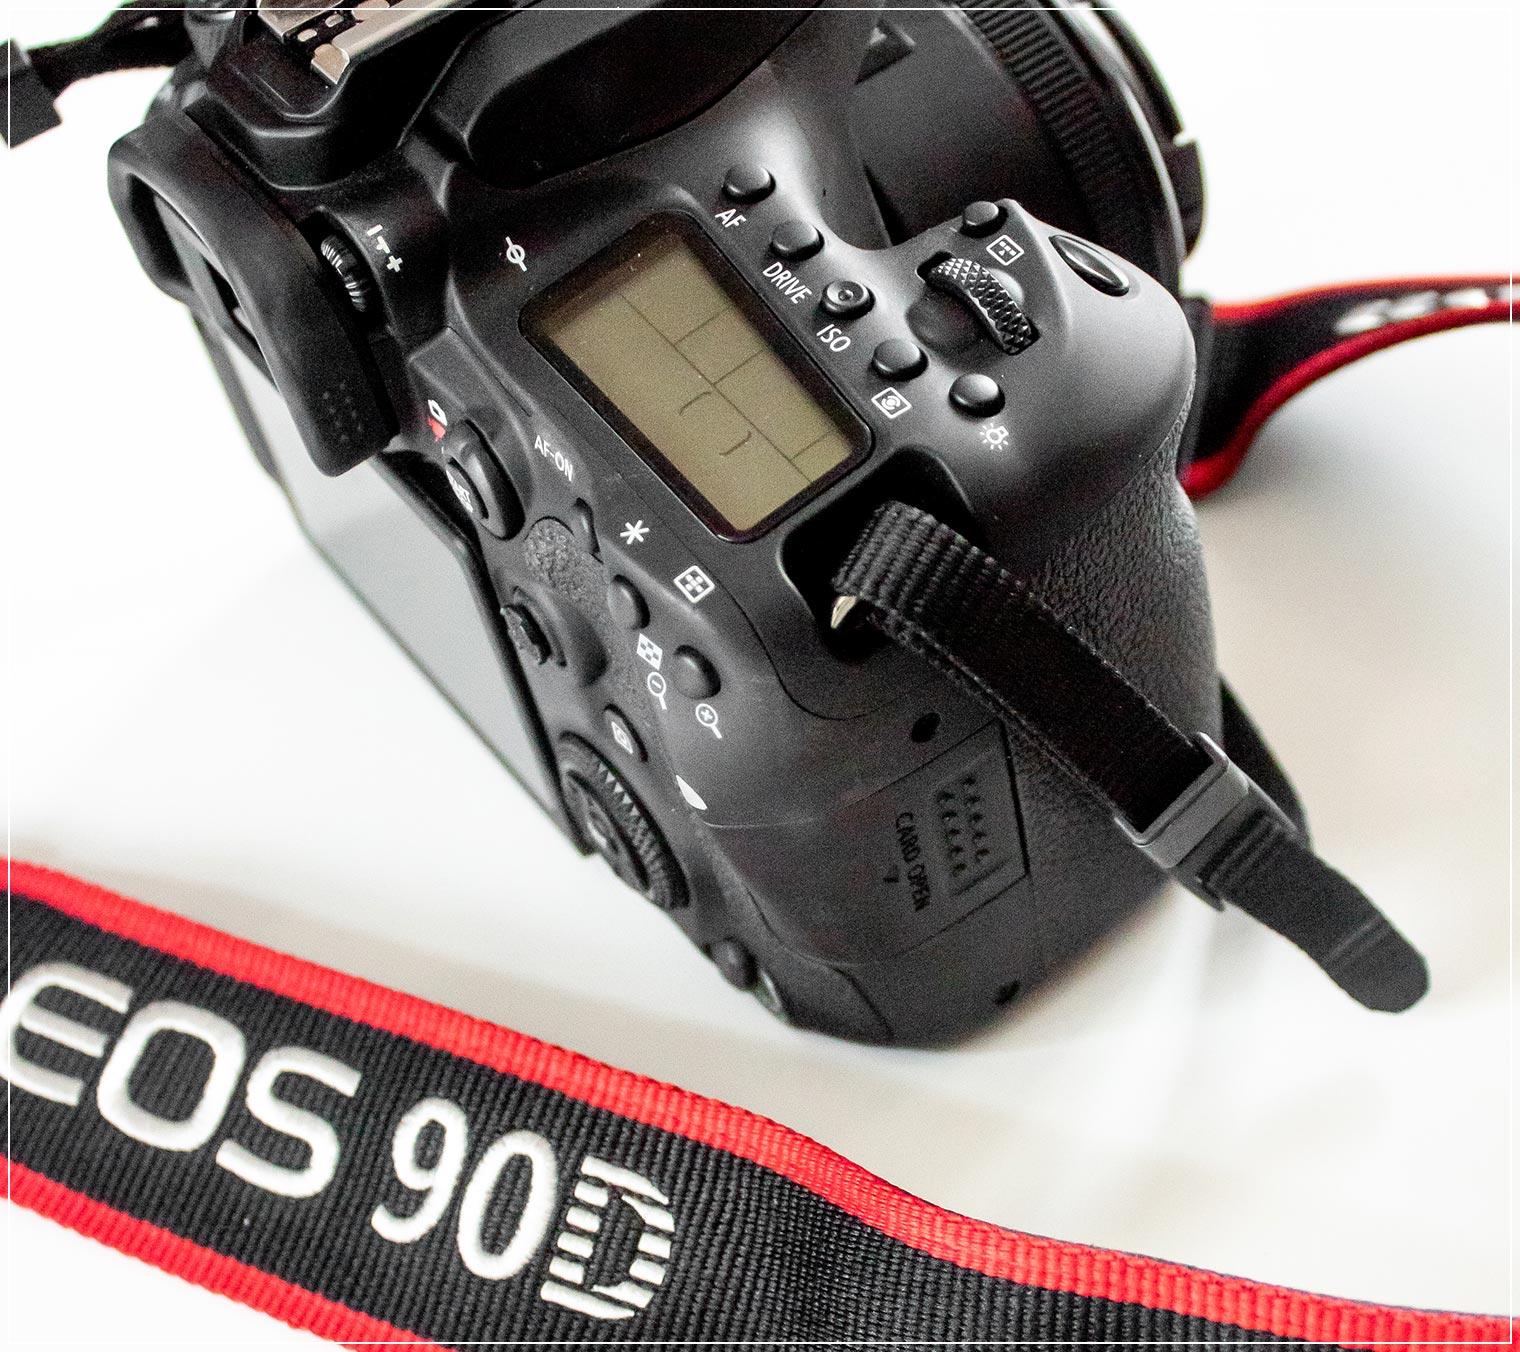 Bloggerequiment, Kamerareview meiner neuen Kamera Canon Eos 90D